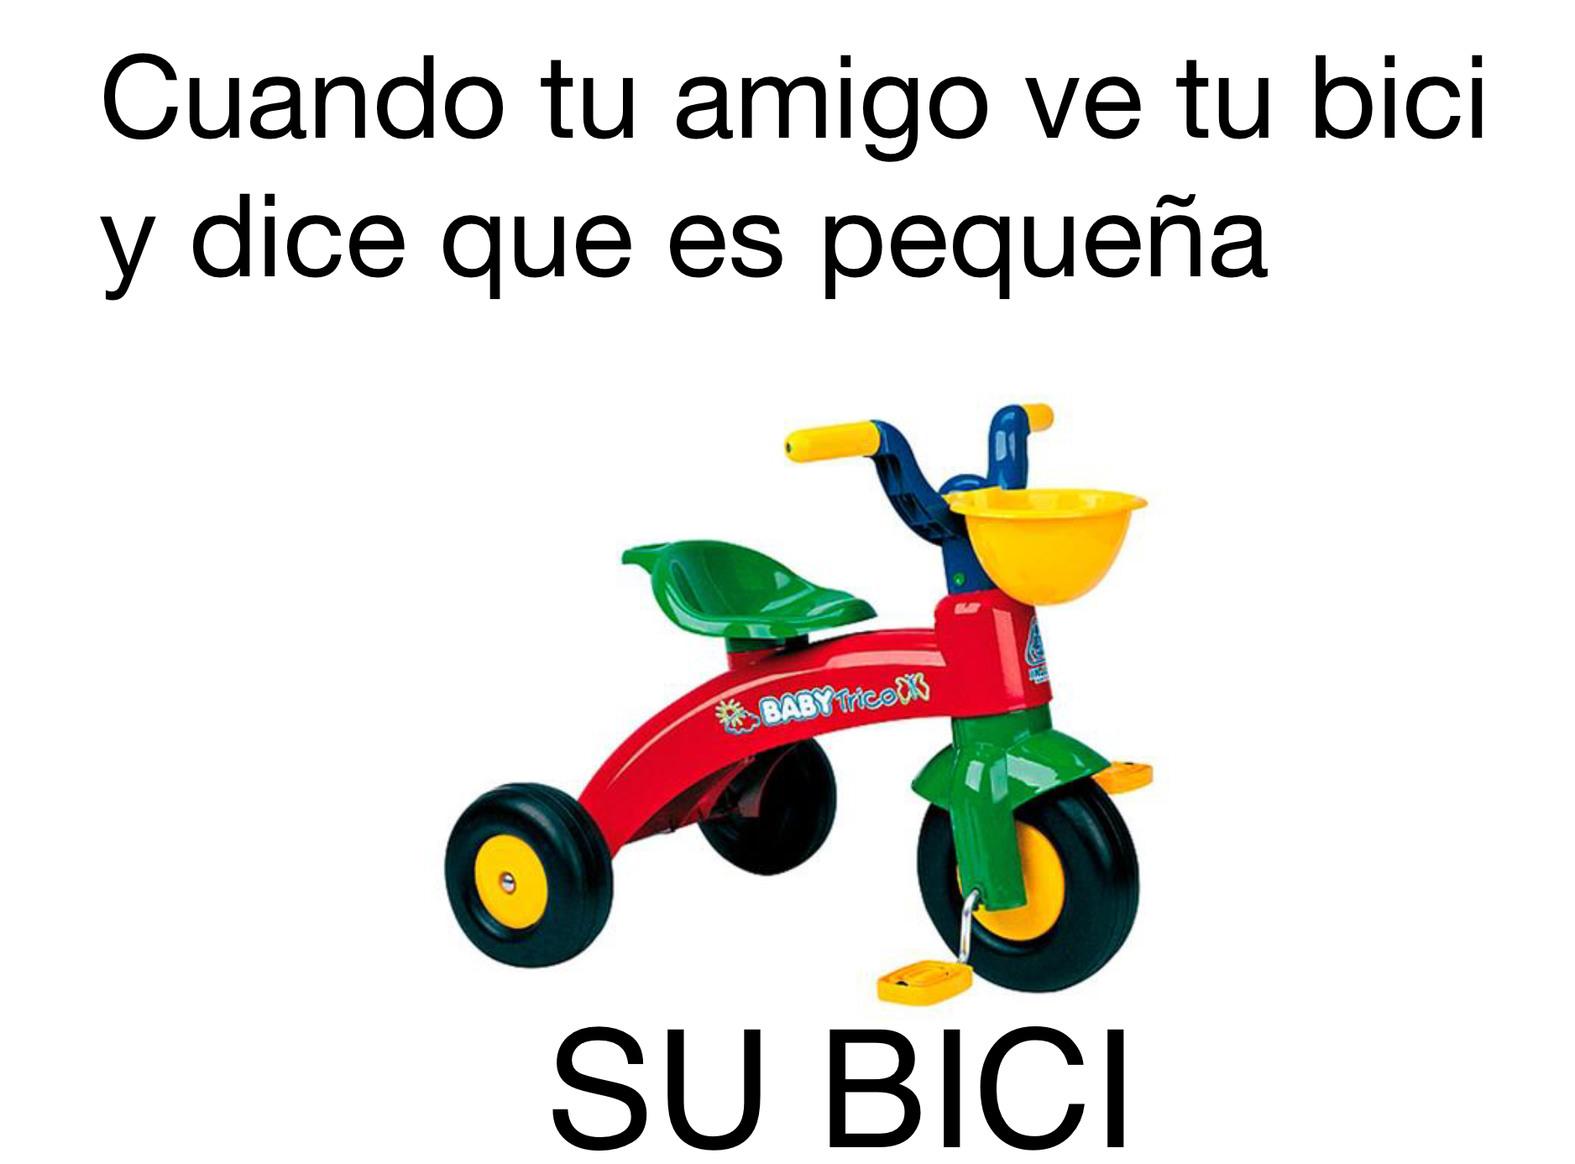 Bici fachera - meme